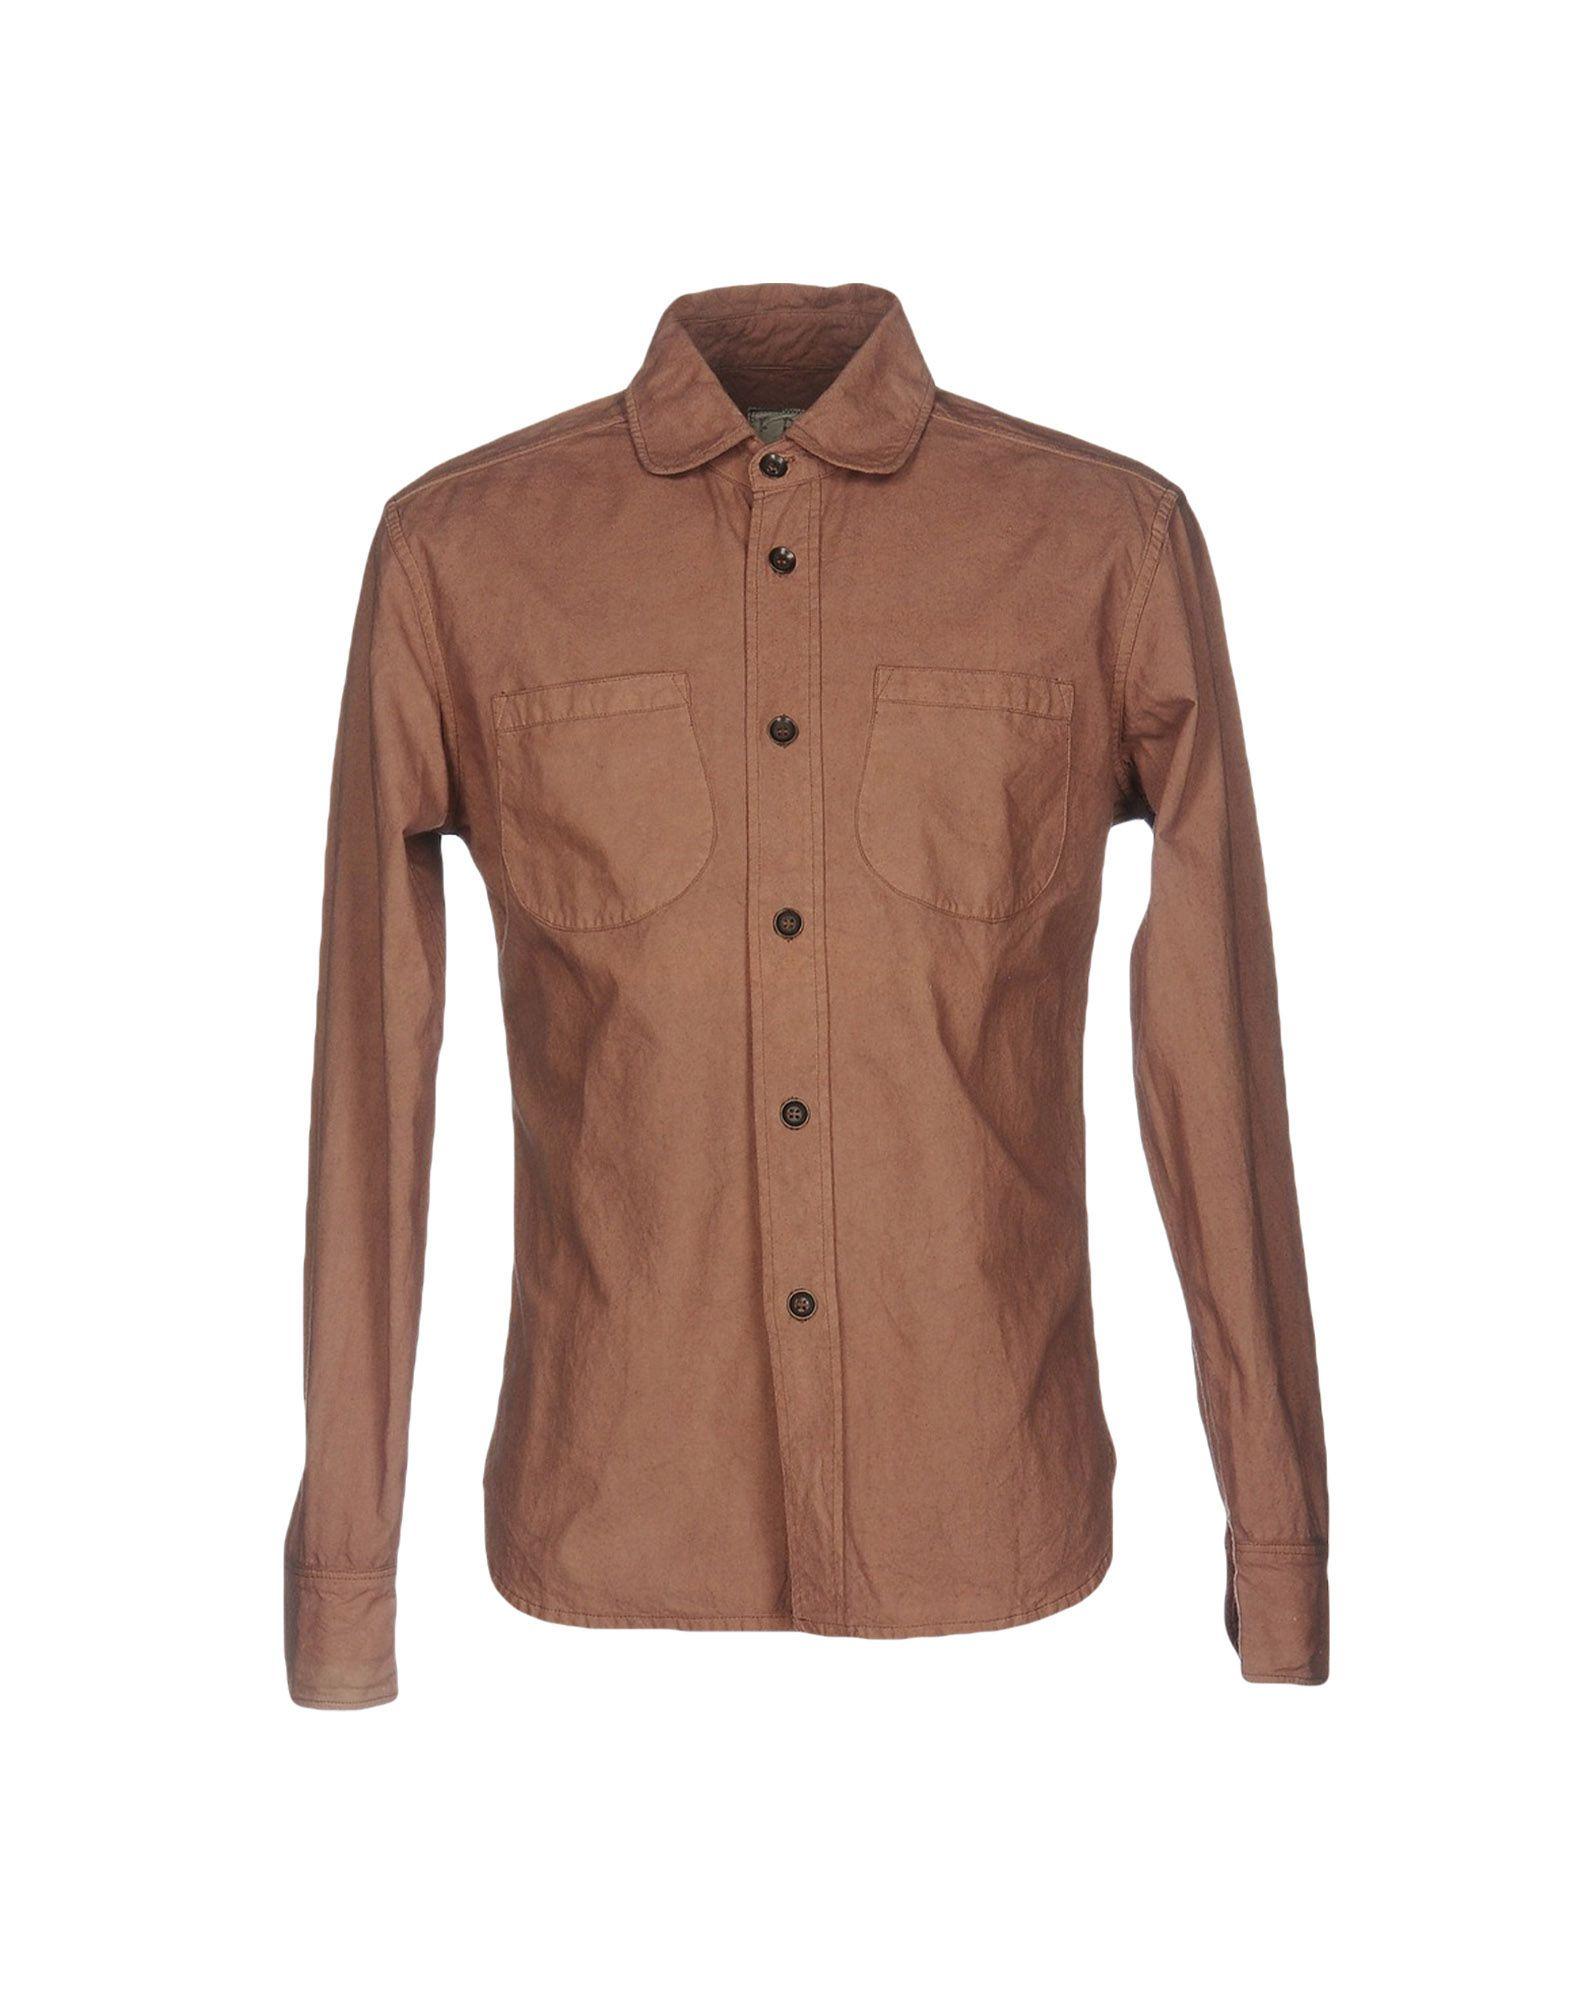 FBC FATBOY CLOTHING Shirts